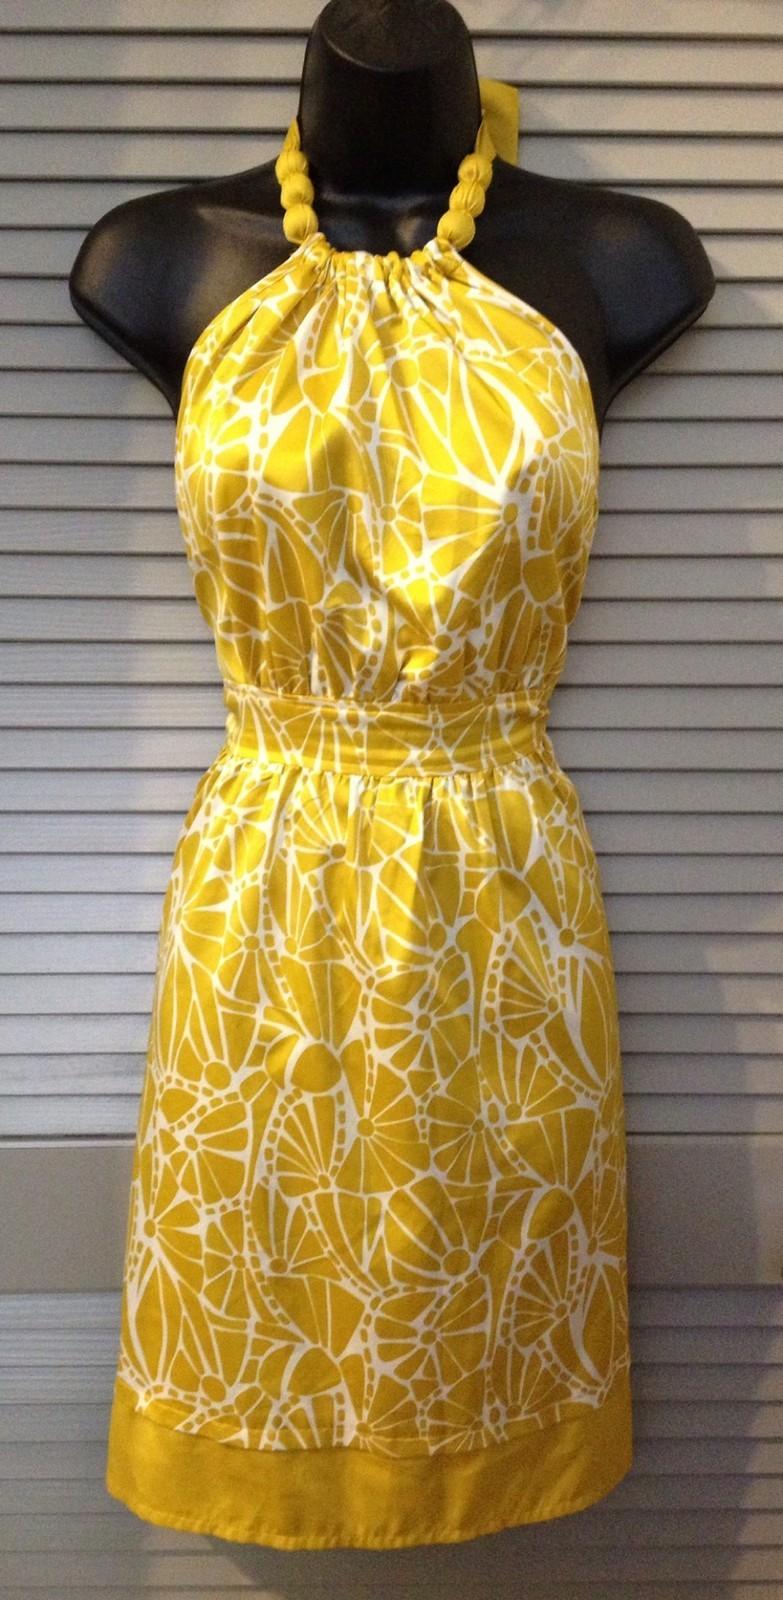 Women's Yellow Floral Print Halter Dress